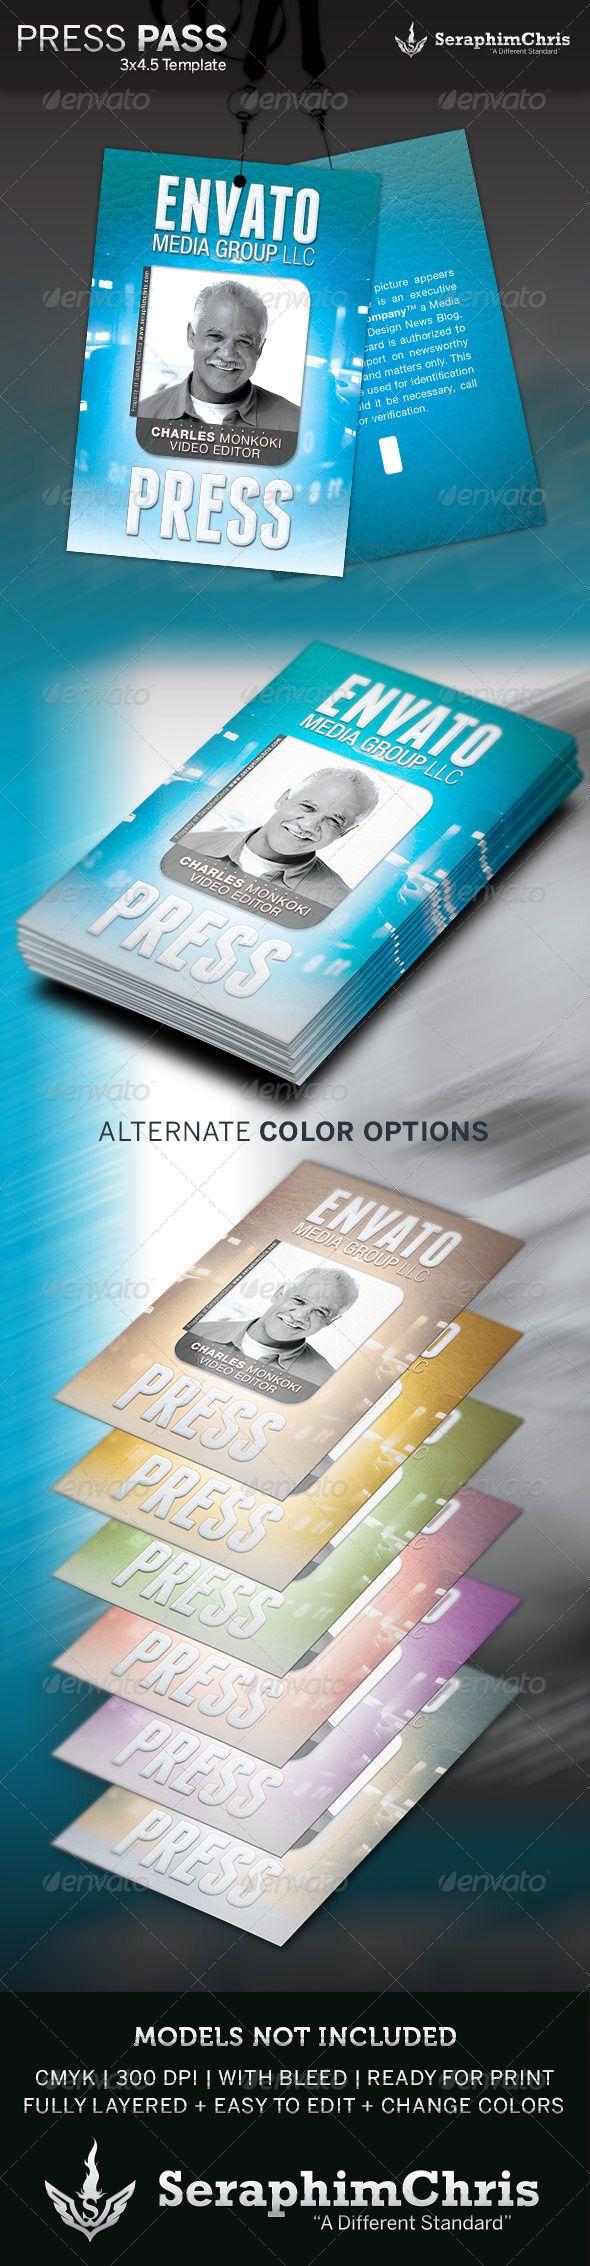 Press Pass Template Press Pass Template Microsoft Word All